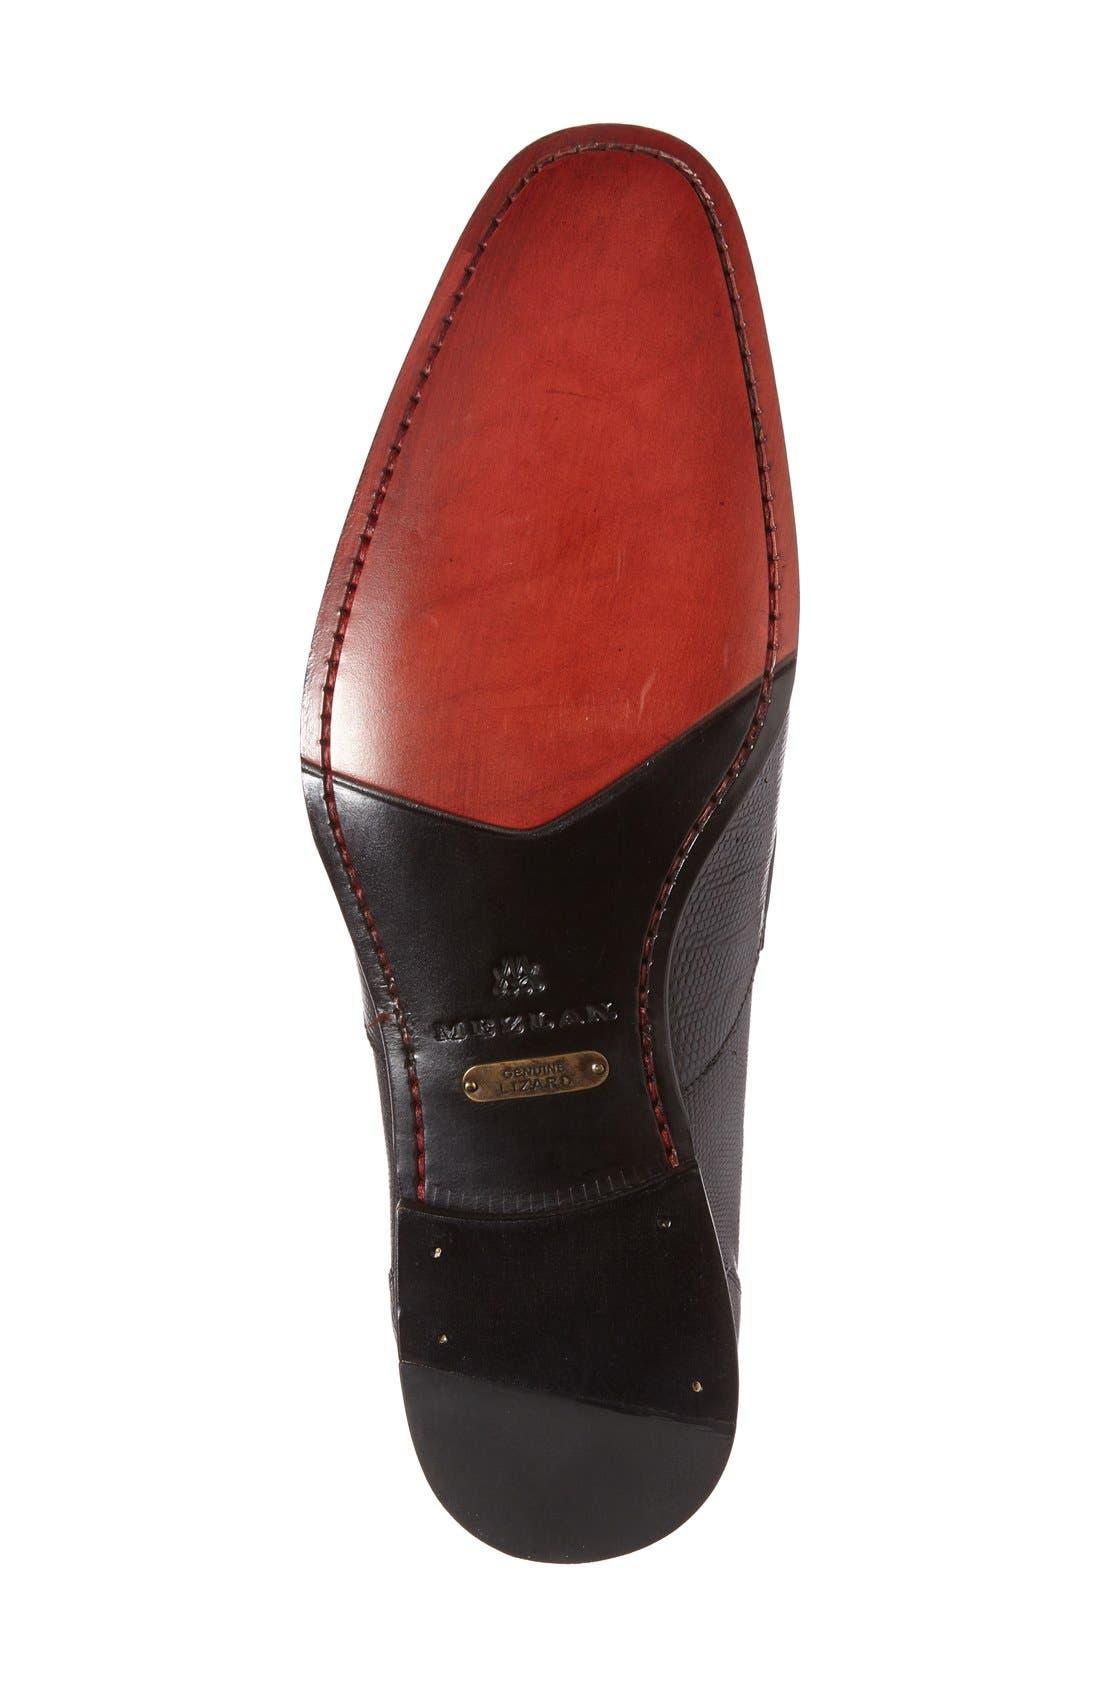 'Lipari' Lizard Leather Penny Loafer,                             Alternate thumbnail 4, color,                             BLACK